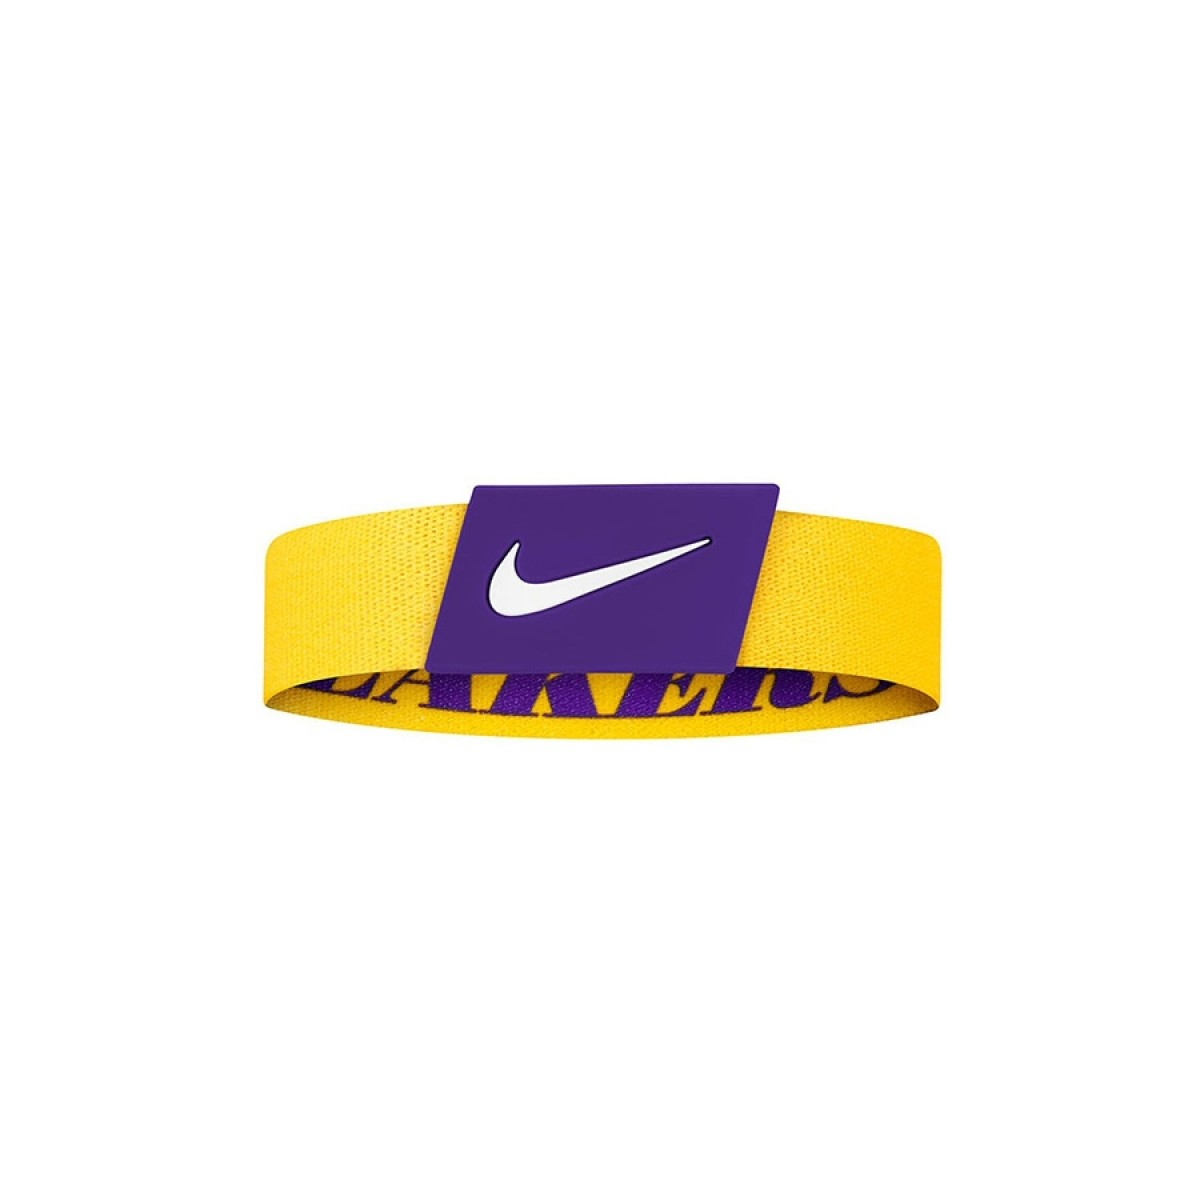 Nike NBA Baller Bands LA Lakers 'Yellow'-N1000539760